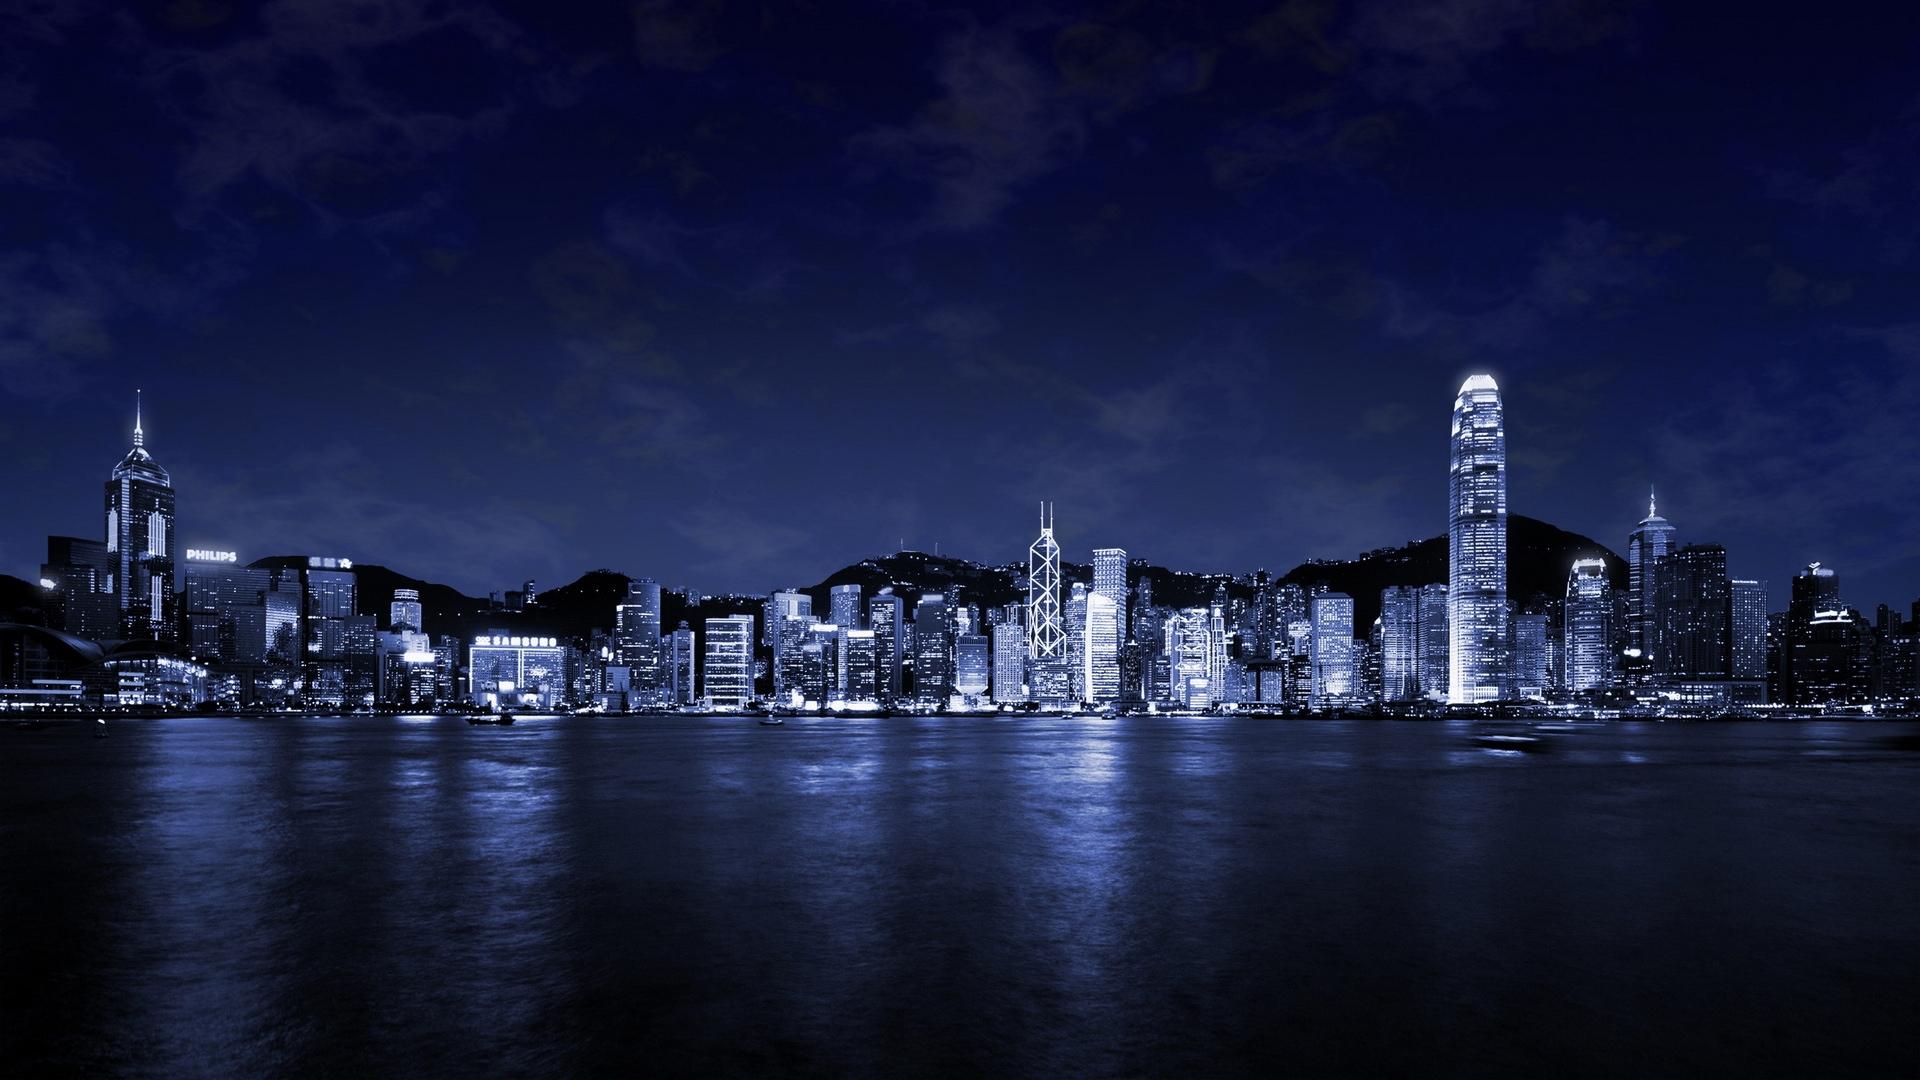 45 Nighttime City Hd Wallpapers On Wallpapersafari